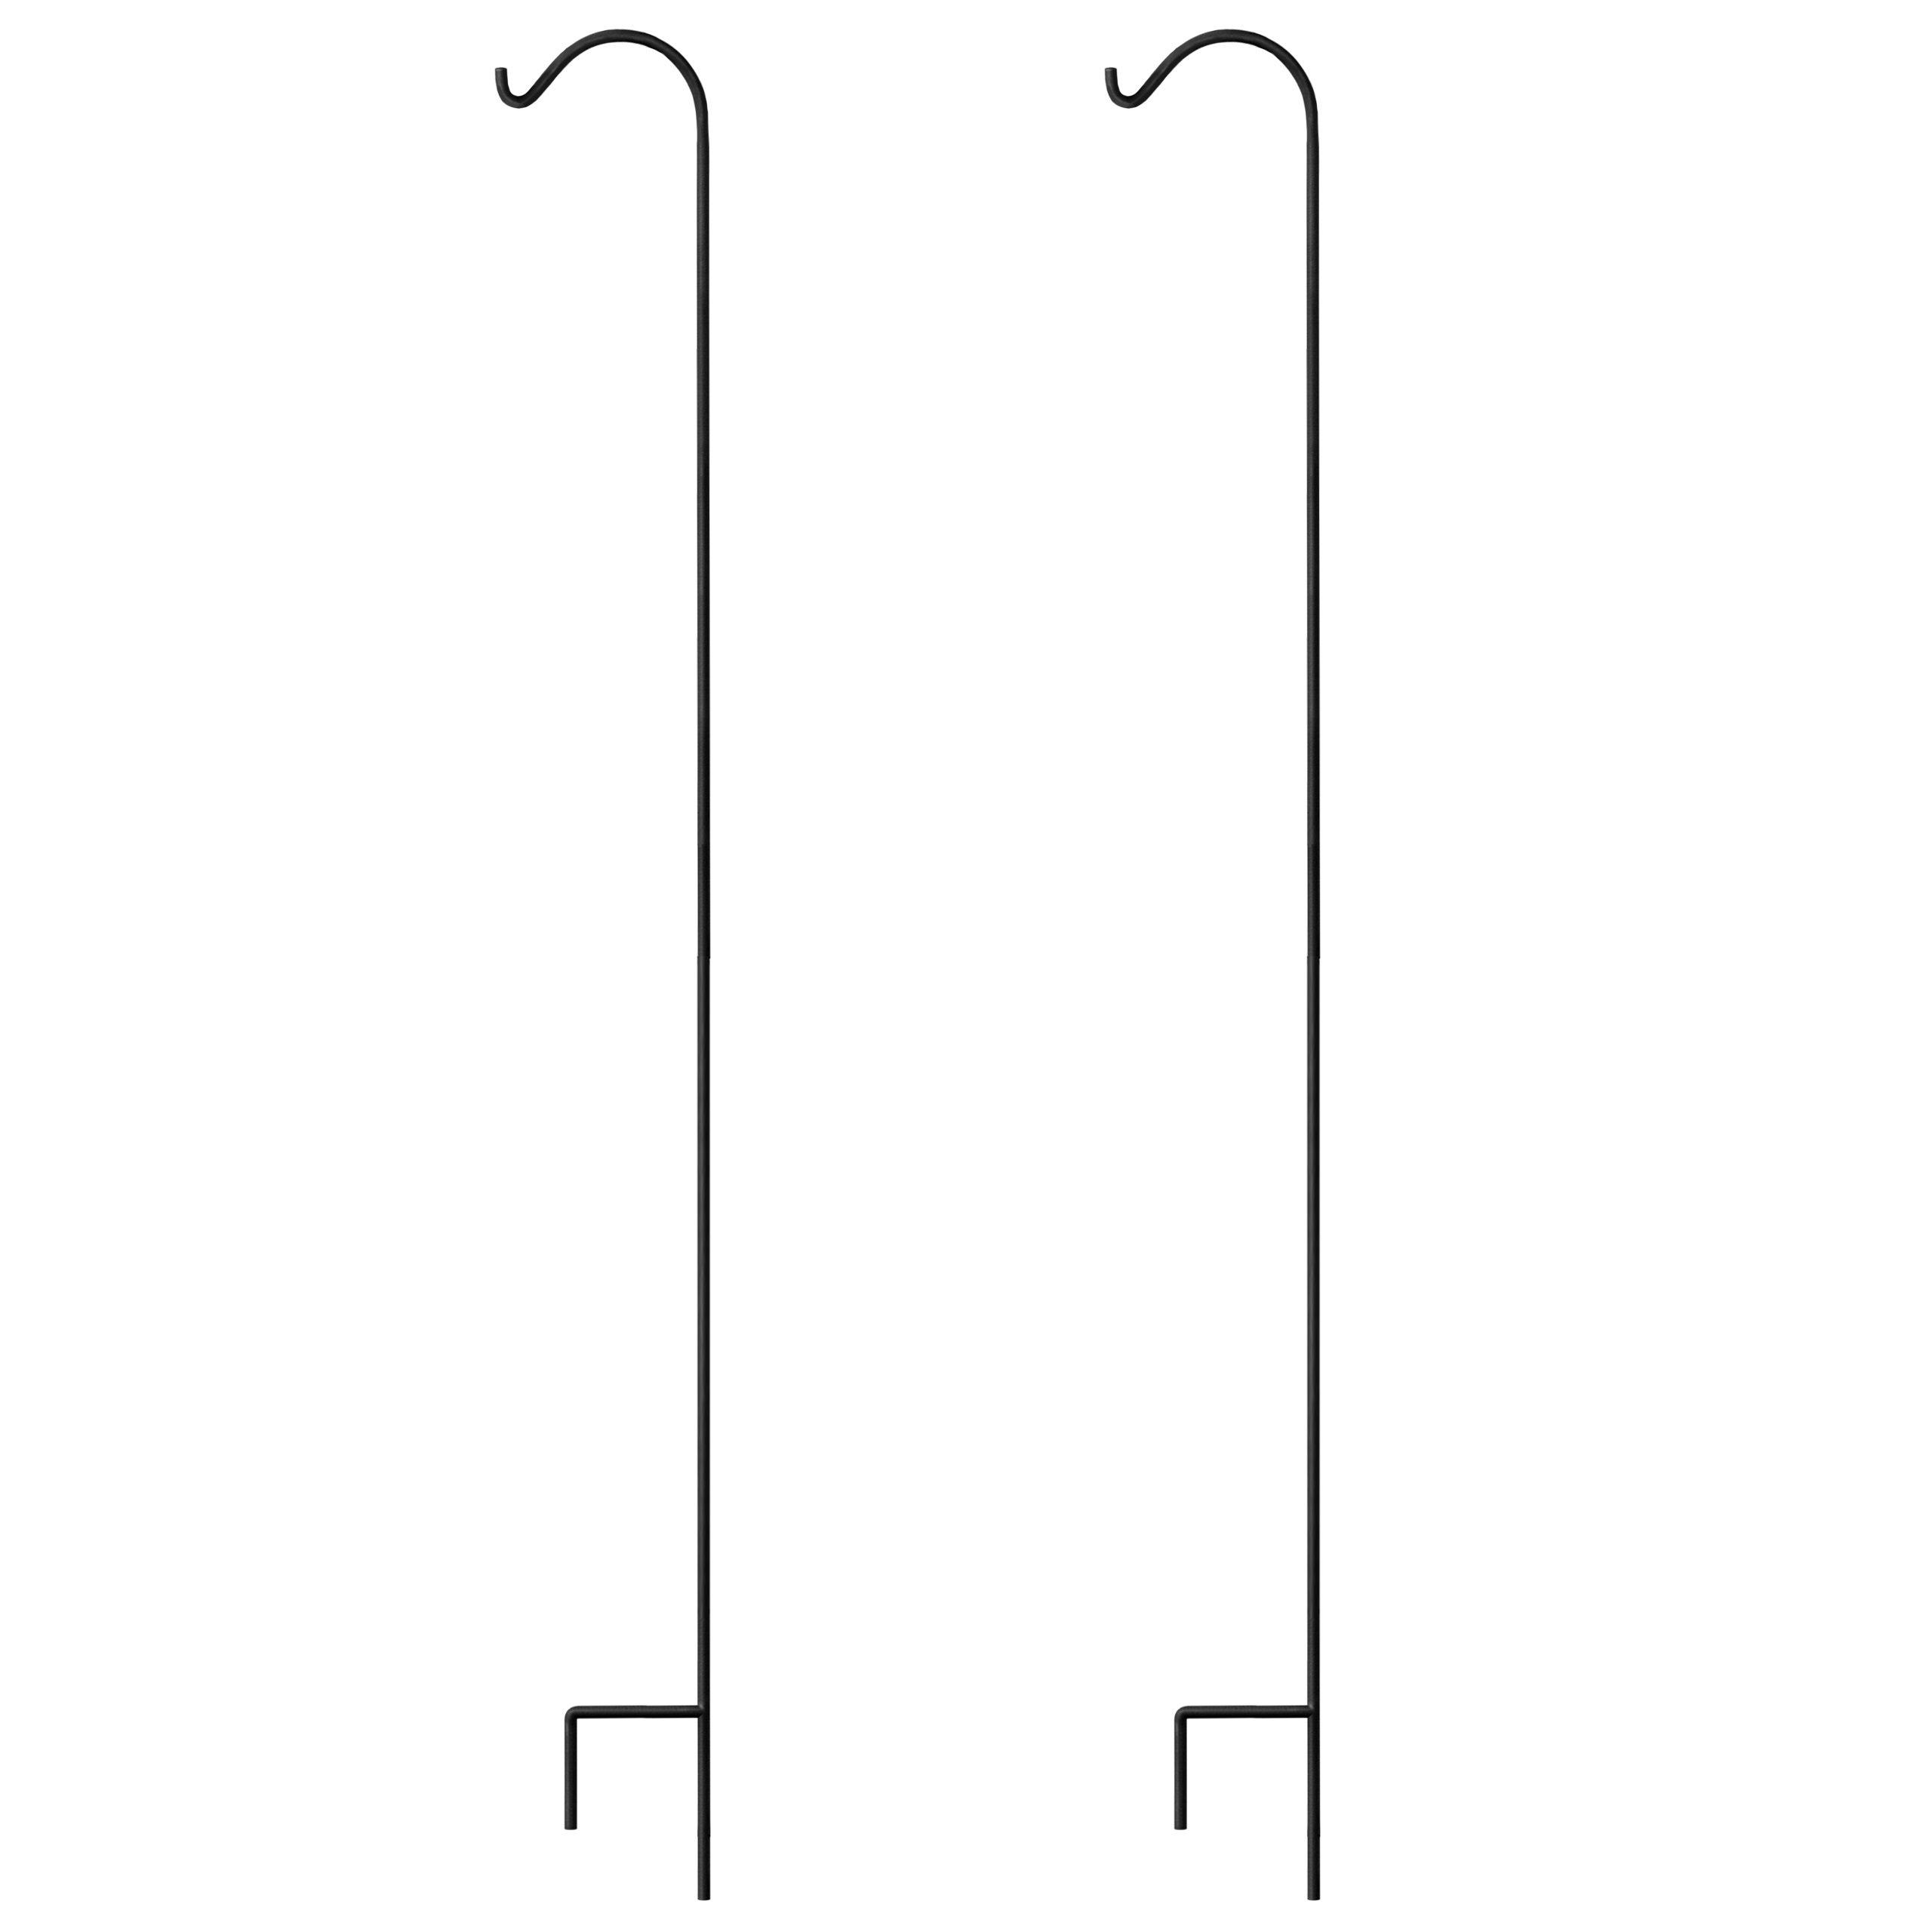 GrayBunny Shepherd Hook, 92 inch Black 3/5 Inch Thick, Set of 2, Solid Single Piece Heavy Duty Rust Resistant Premium Metal Hook Hangers For Weddings, Plant Baskets Solar Lights Lantern Bird Feeders by GrayBunny